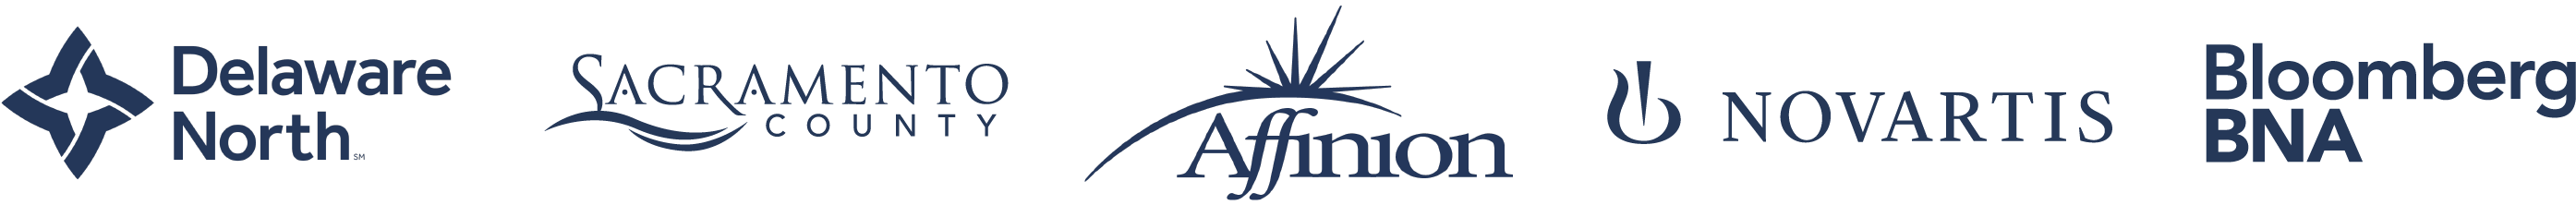 Logo strip of Delaware North, Sacramento County, Affinion, Novartis, and Bloomberg BNA